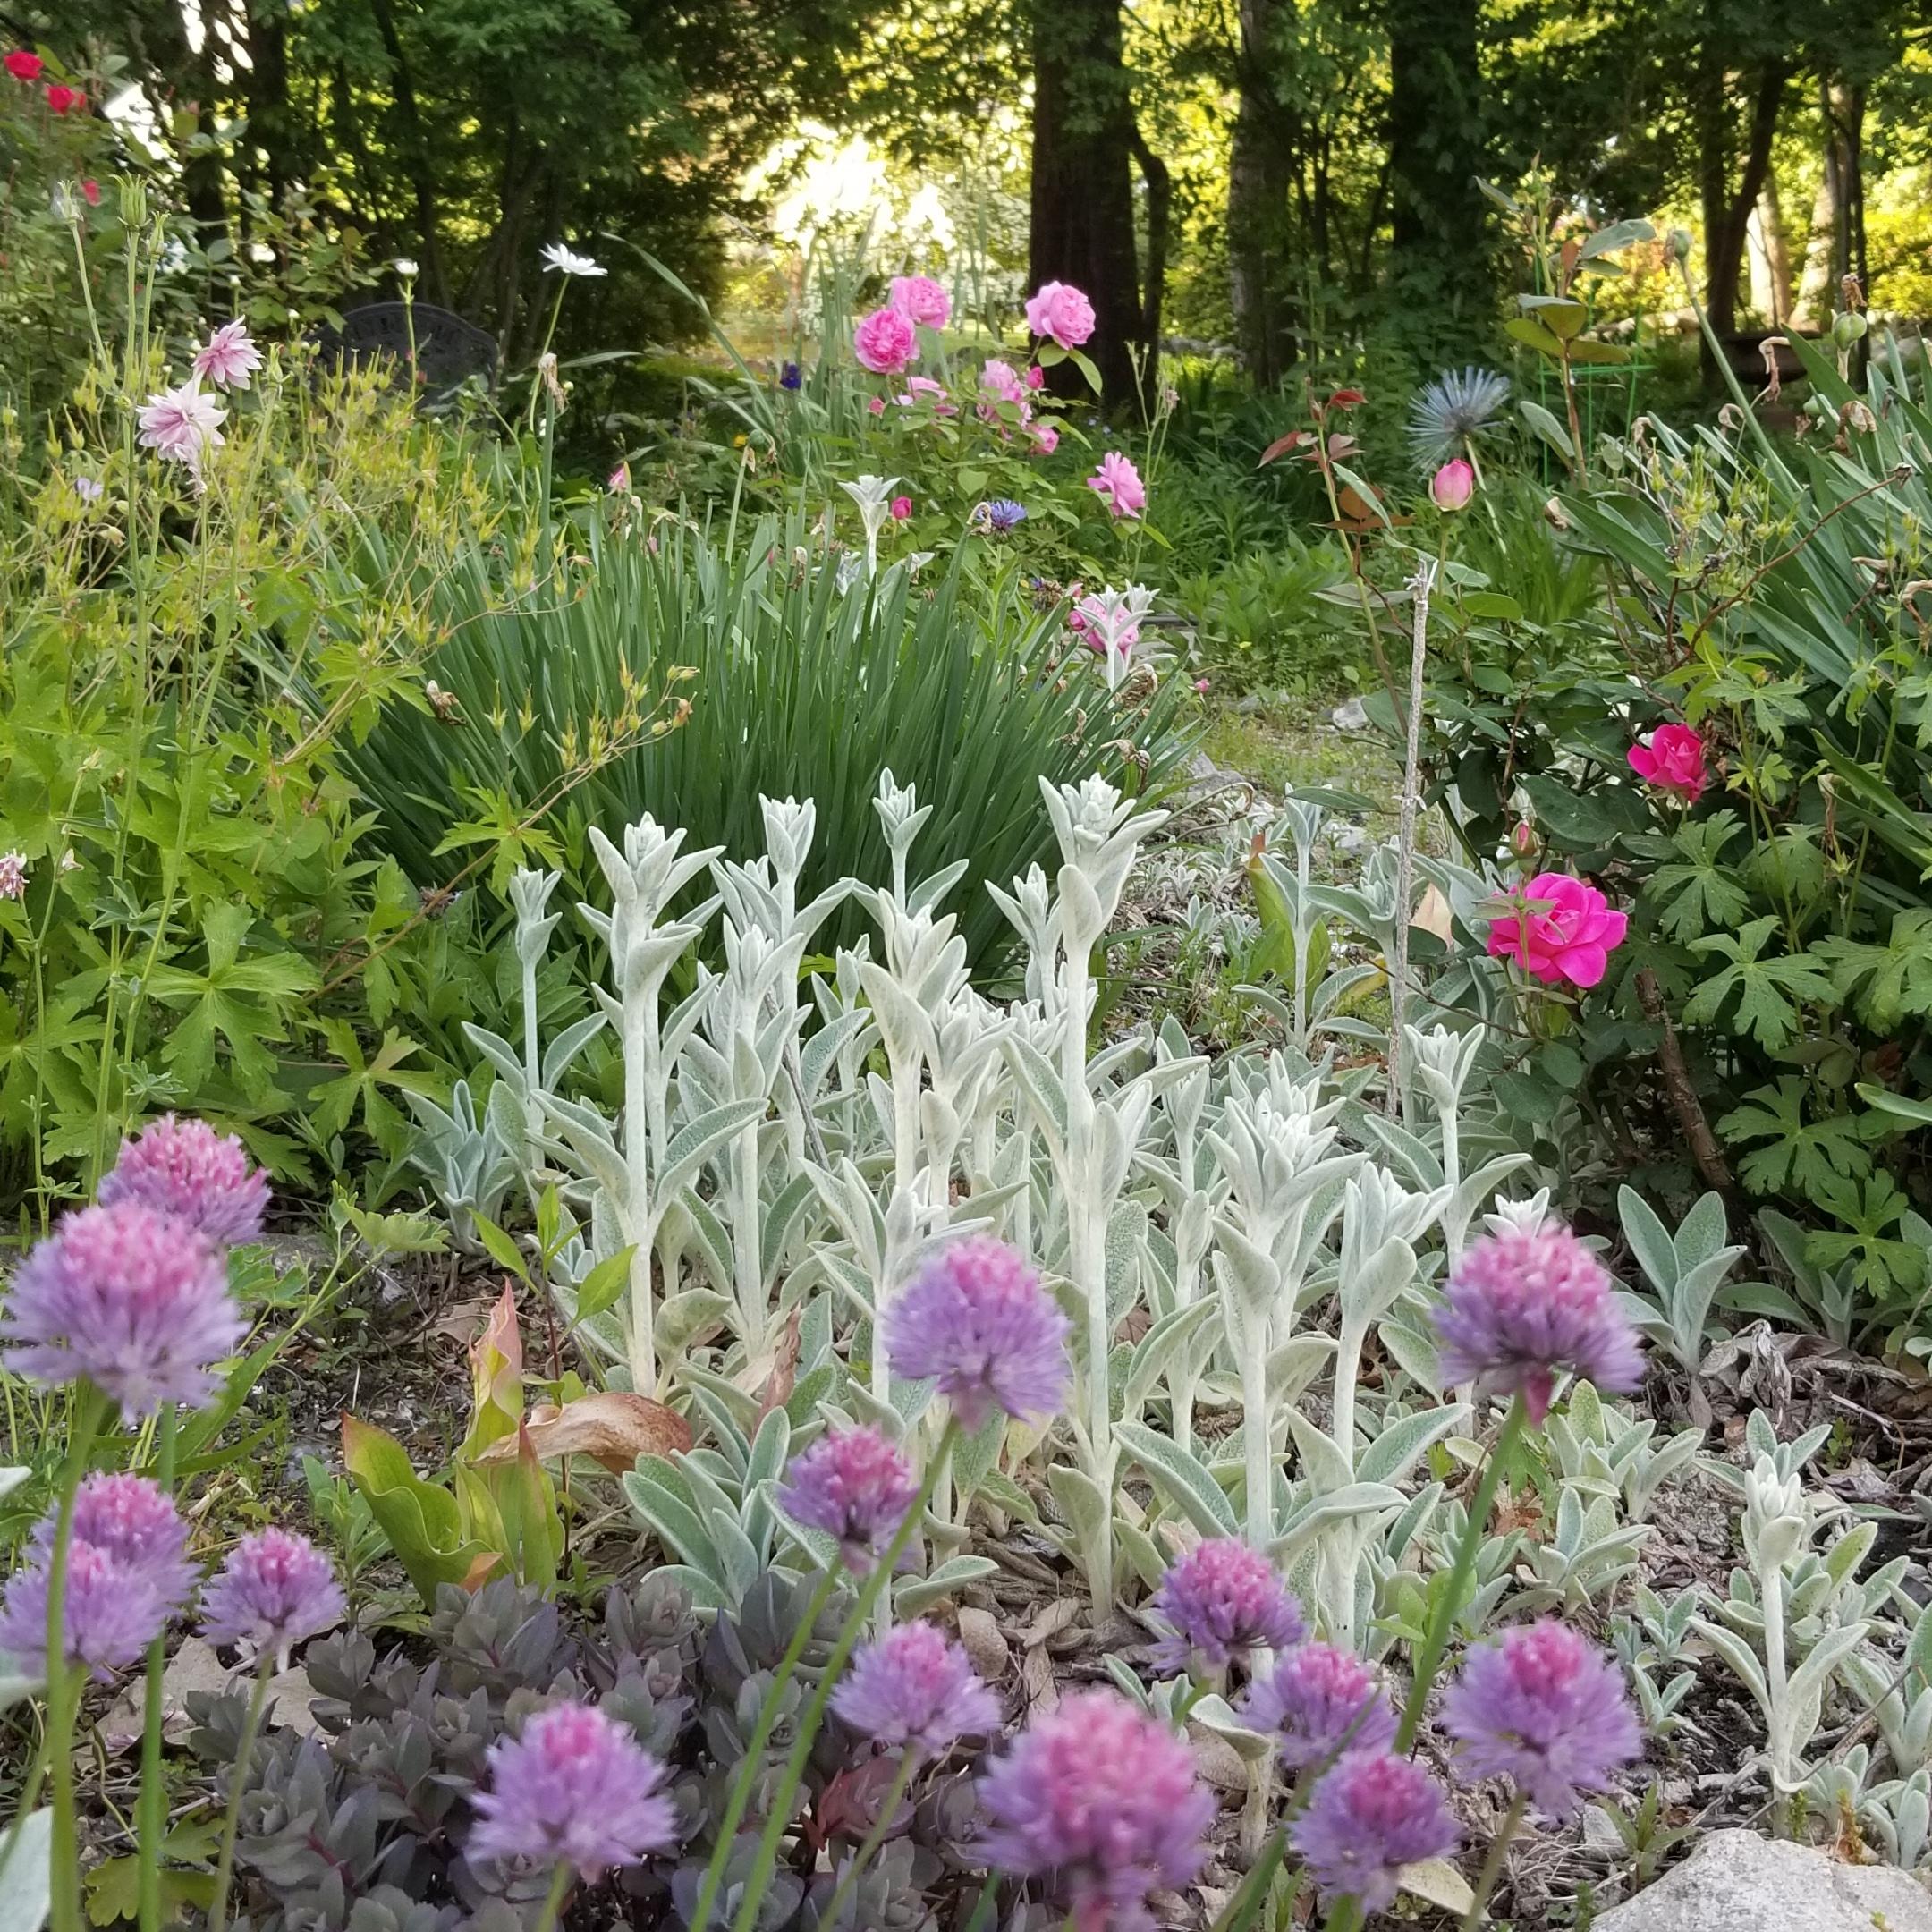 Springtime in the garden - Garlic chives, roses, lamb's ear, aquilegia, sedum. Maureen Christmas AIFD,CFD, EMC